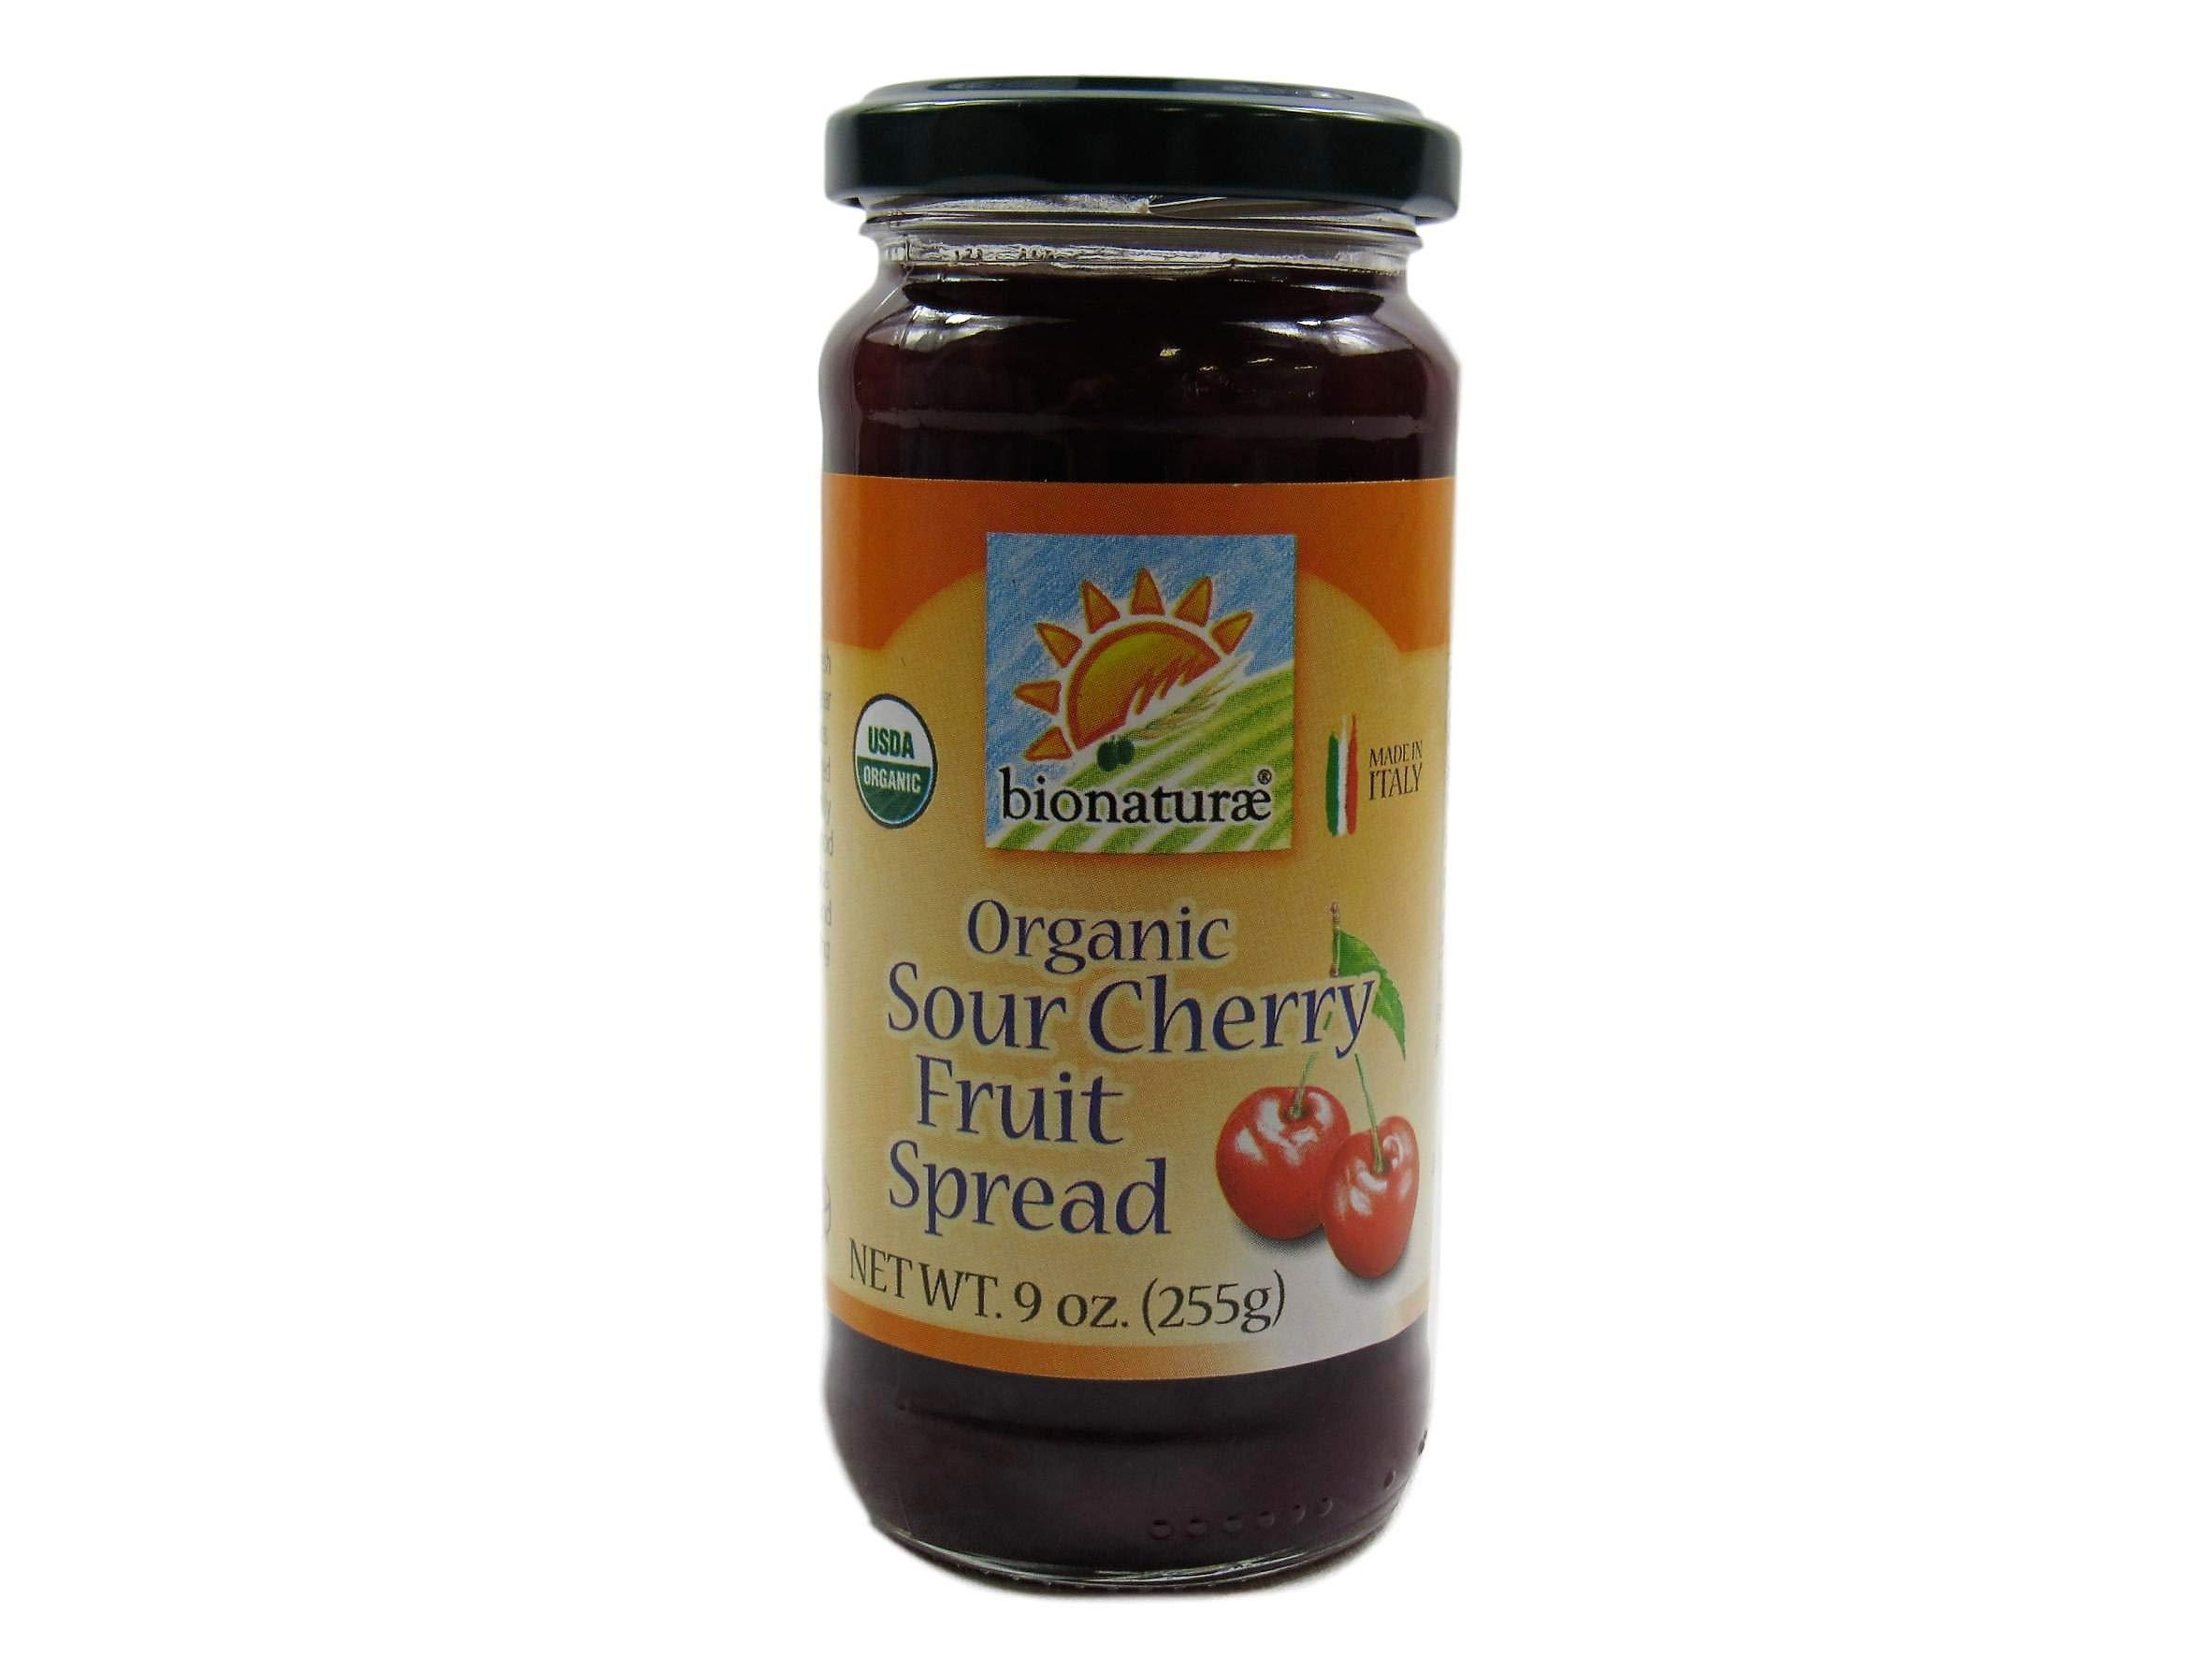 BIONATURAE FRUIT SPREAD SOUR CHERRY, 9 OZ